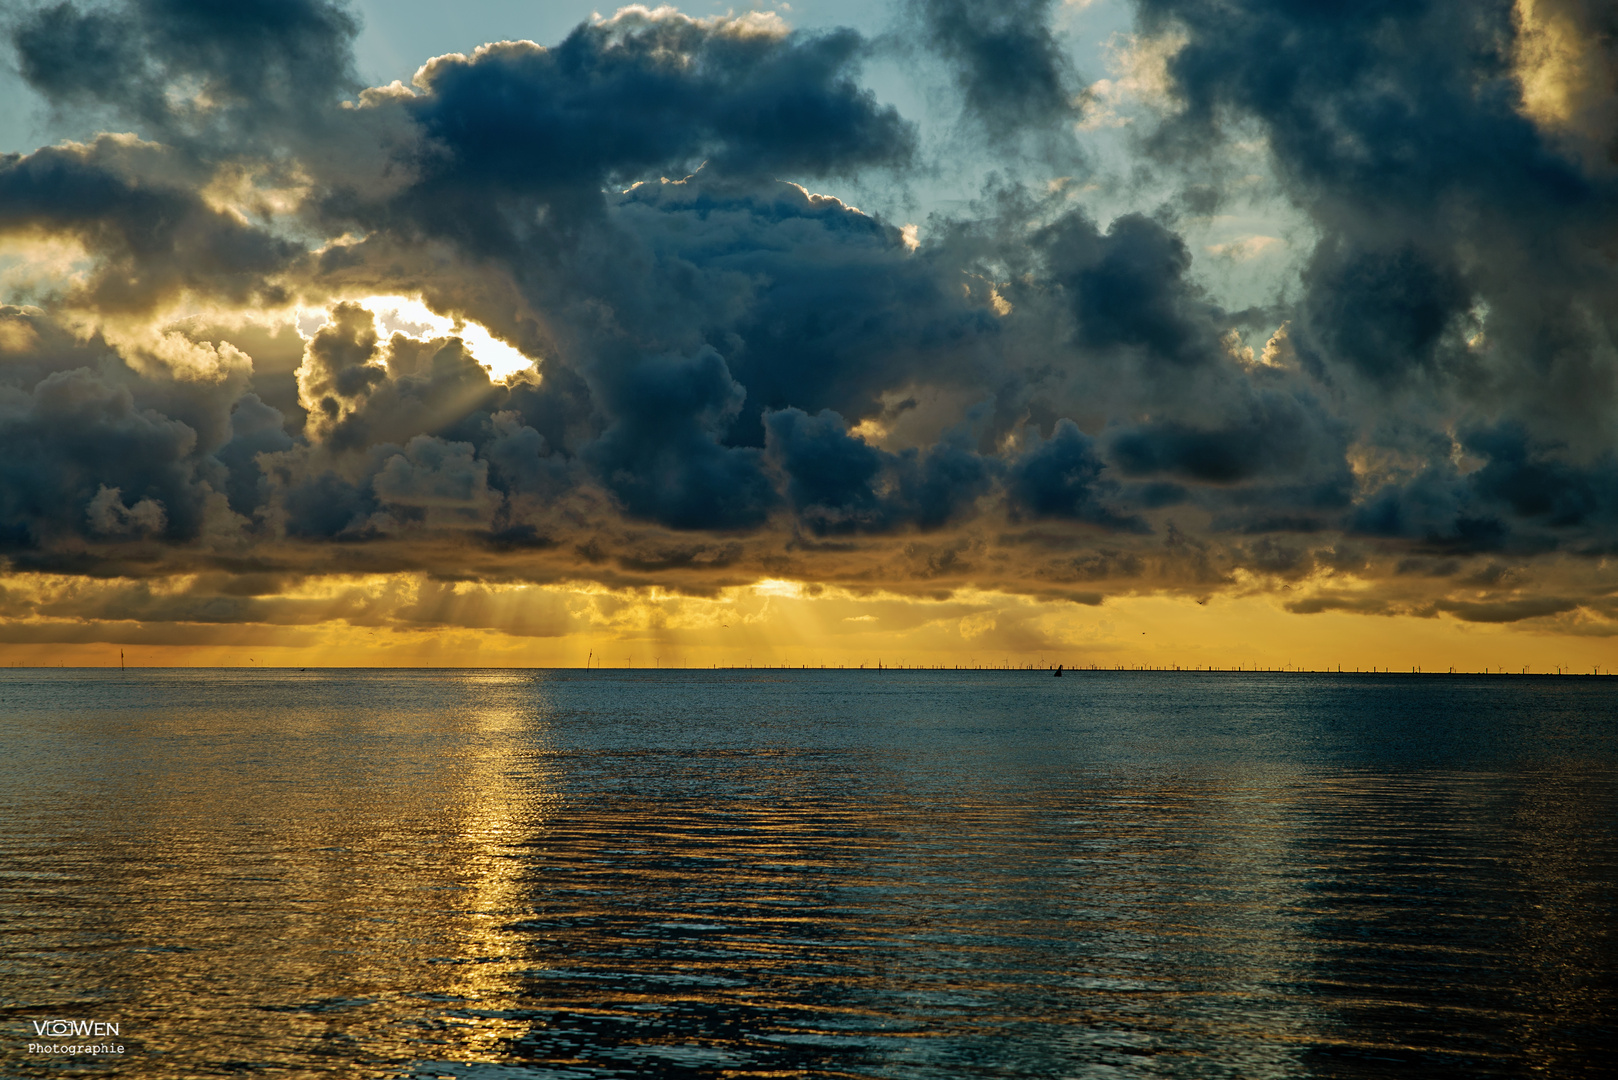 Morgens Früh an der Nordseee